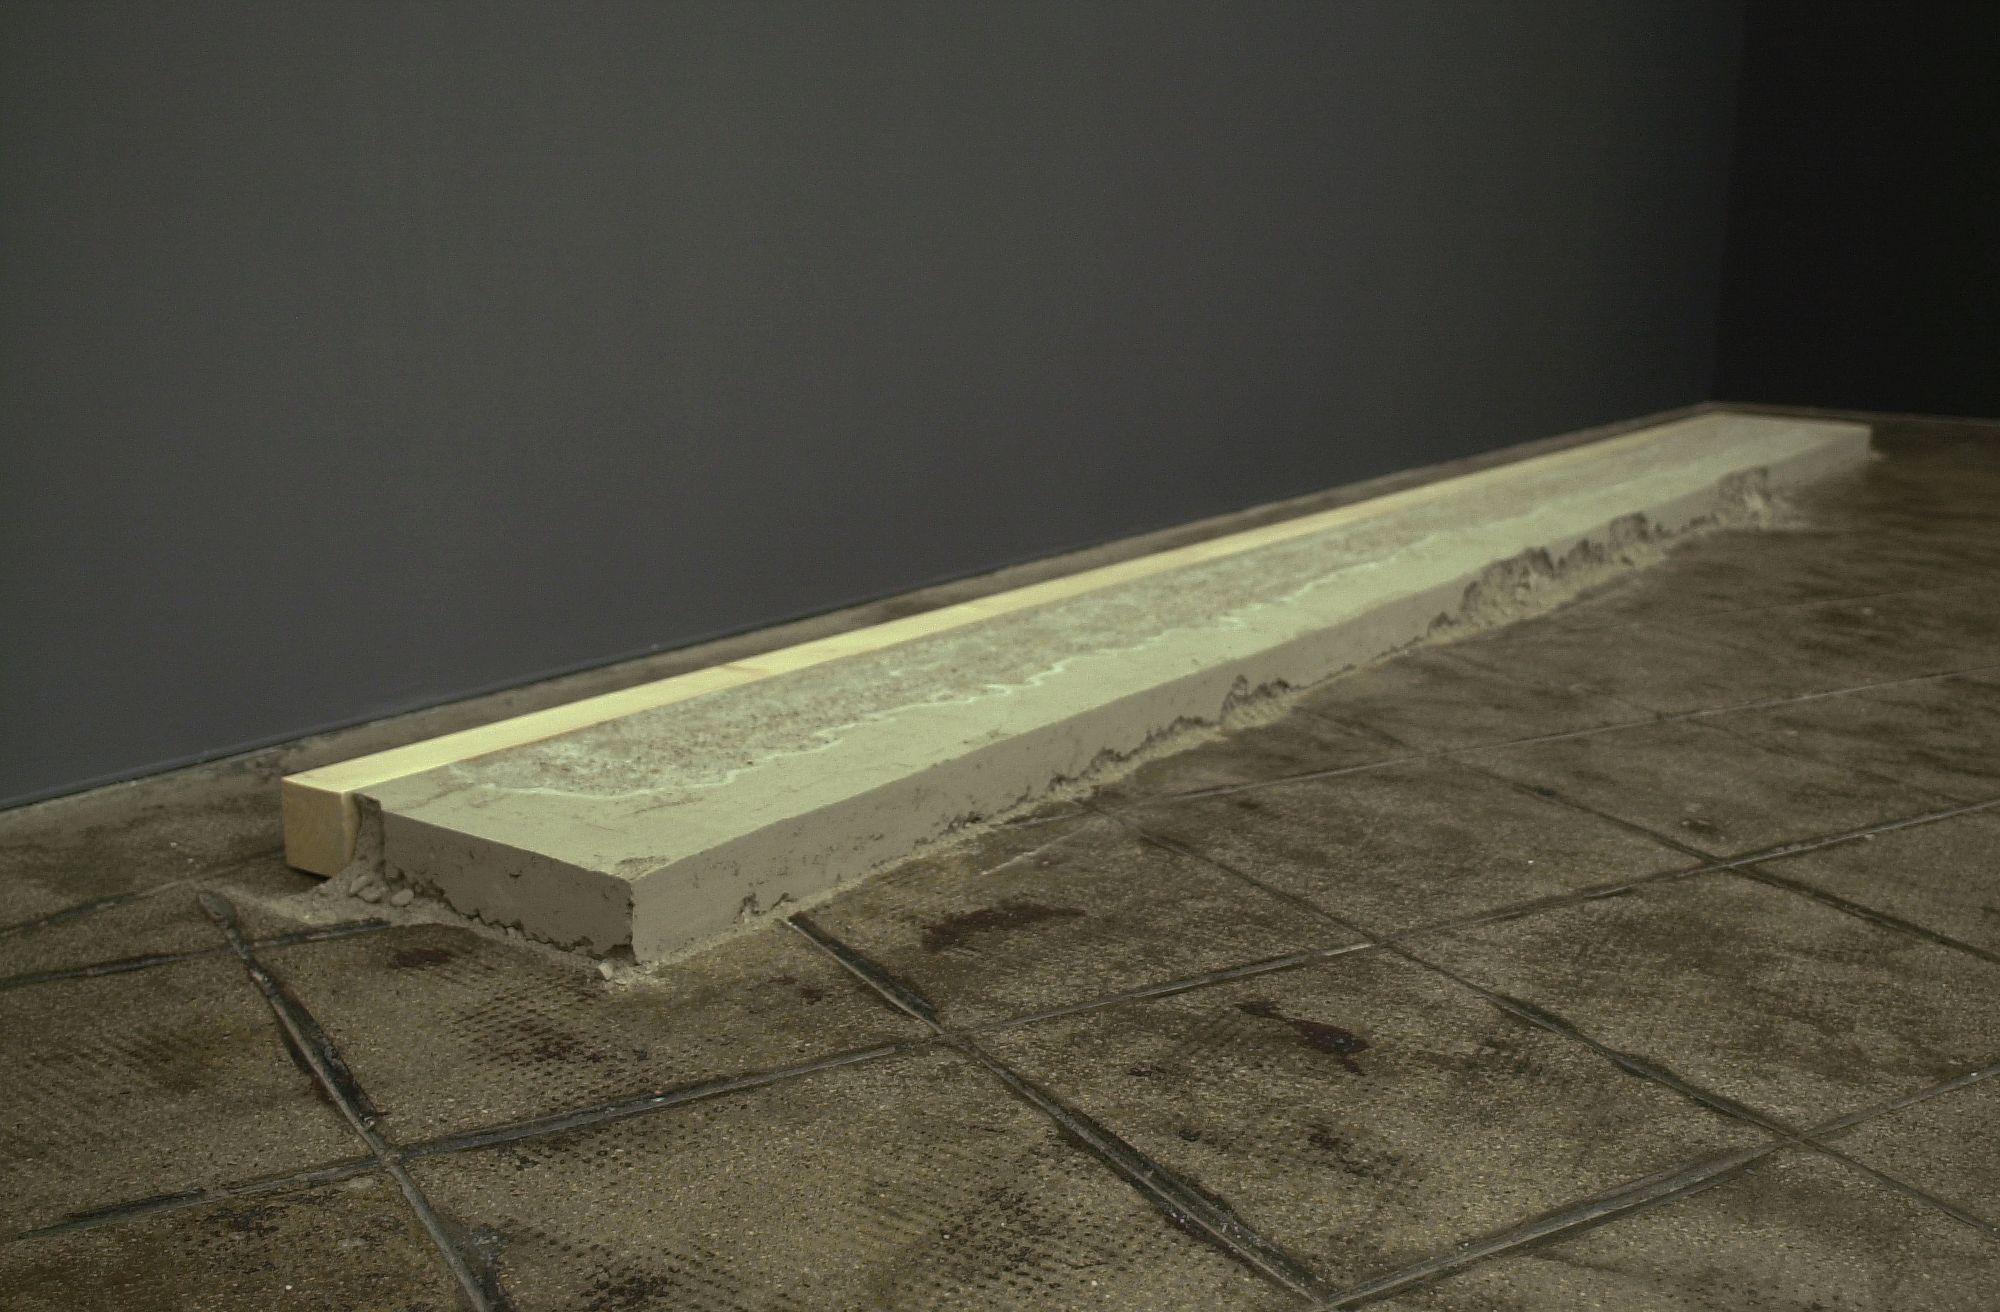 Untitled (Base Line), 2009 |  | ProjecteSD